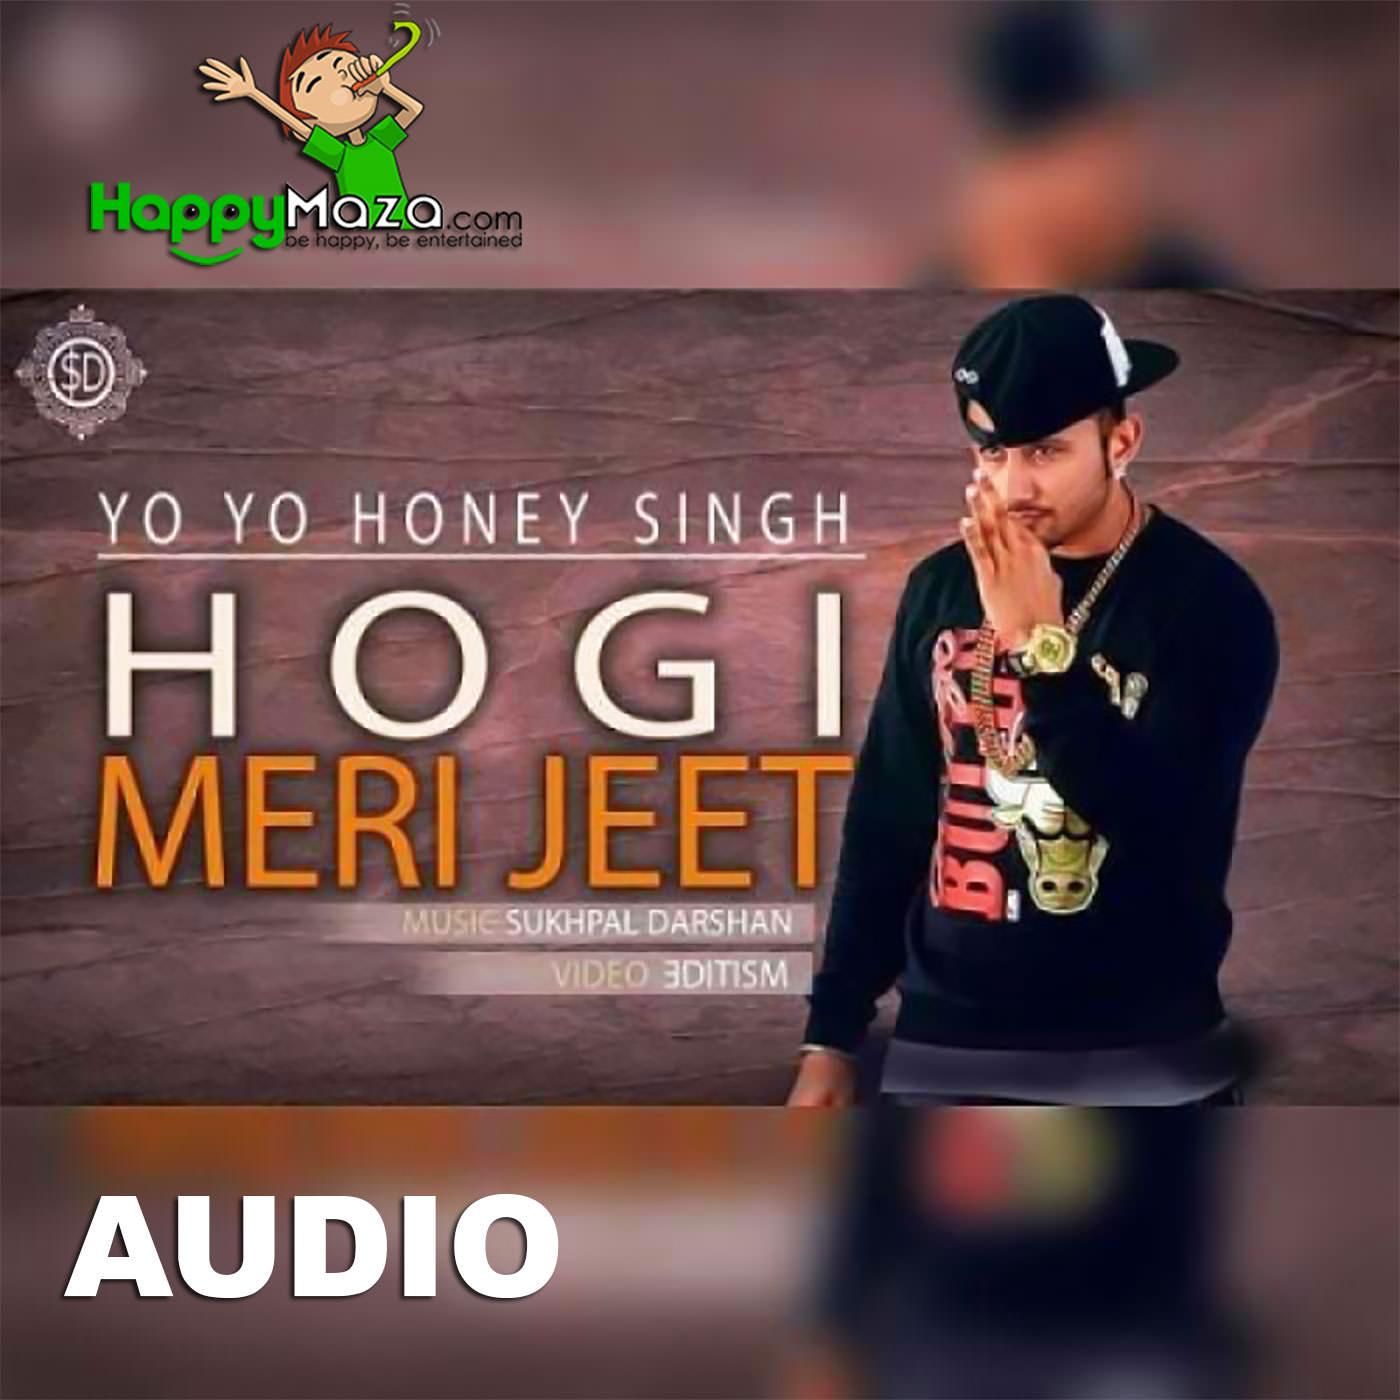 Tu Jo Kahe De Agar Song Download Mp3: Hogi Meri Jeet Lyrics